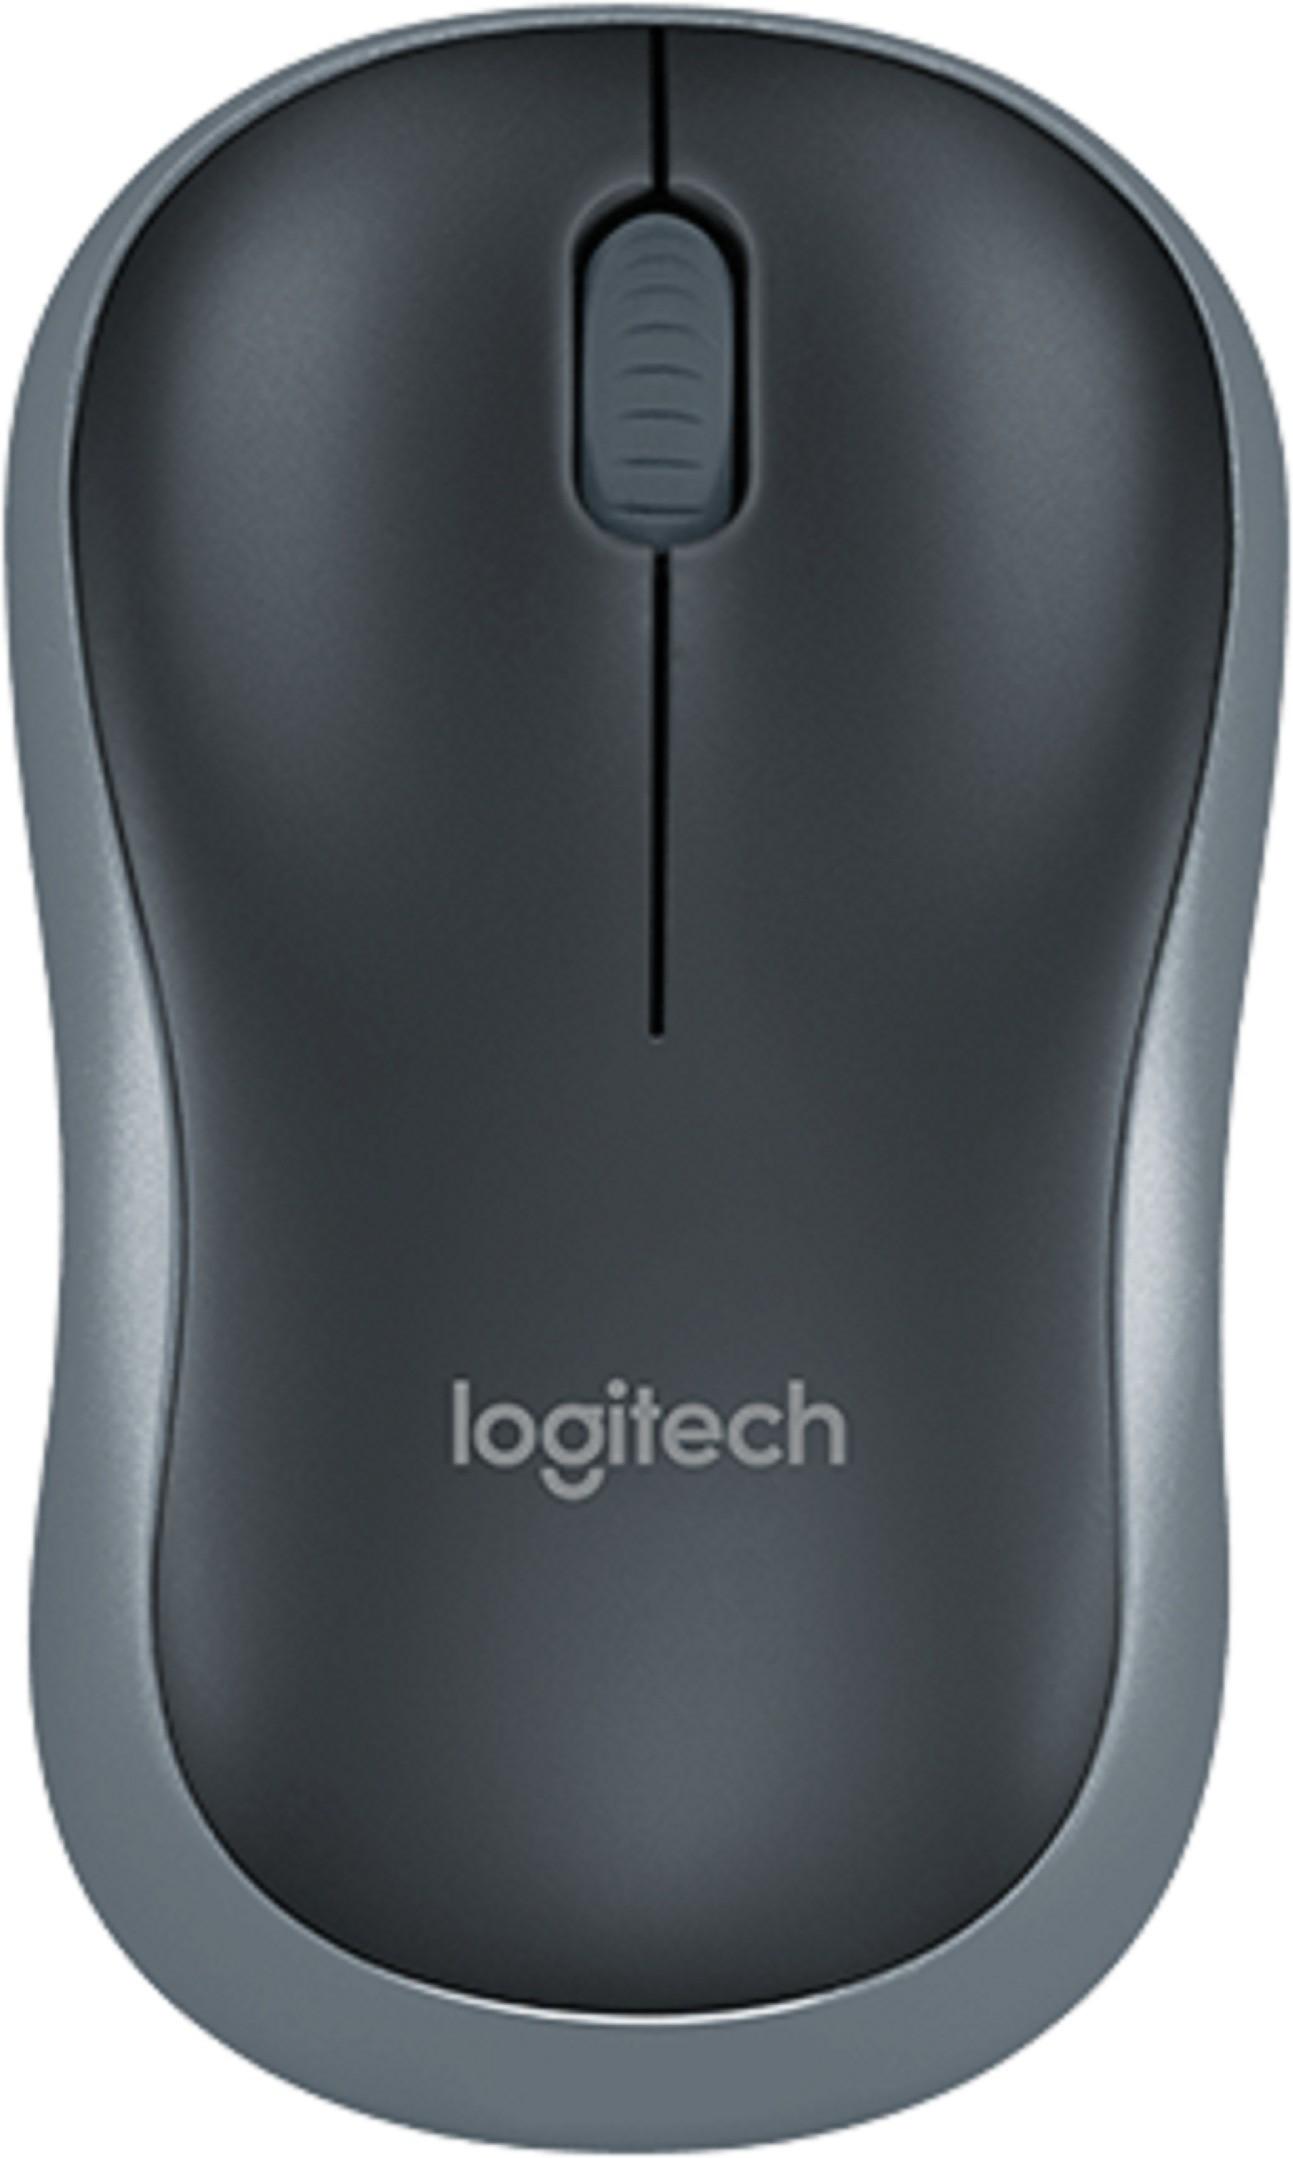 Logitech M185 Wireless Optical Mouse(USB, Grey) image